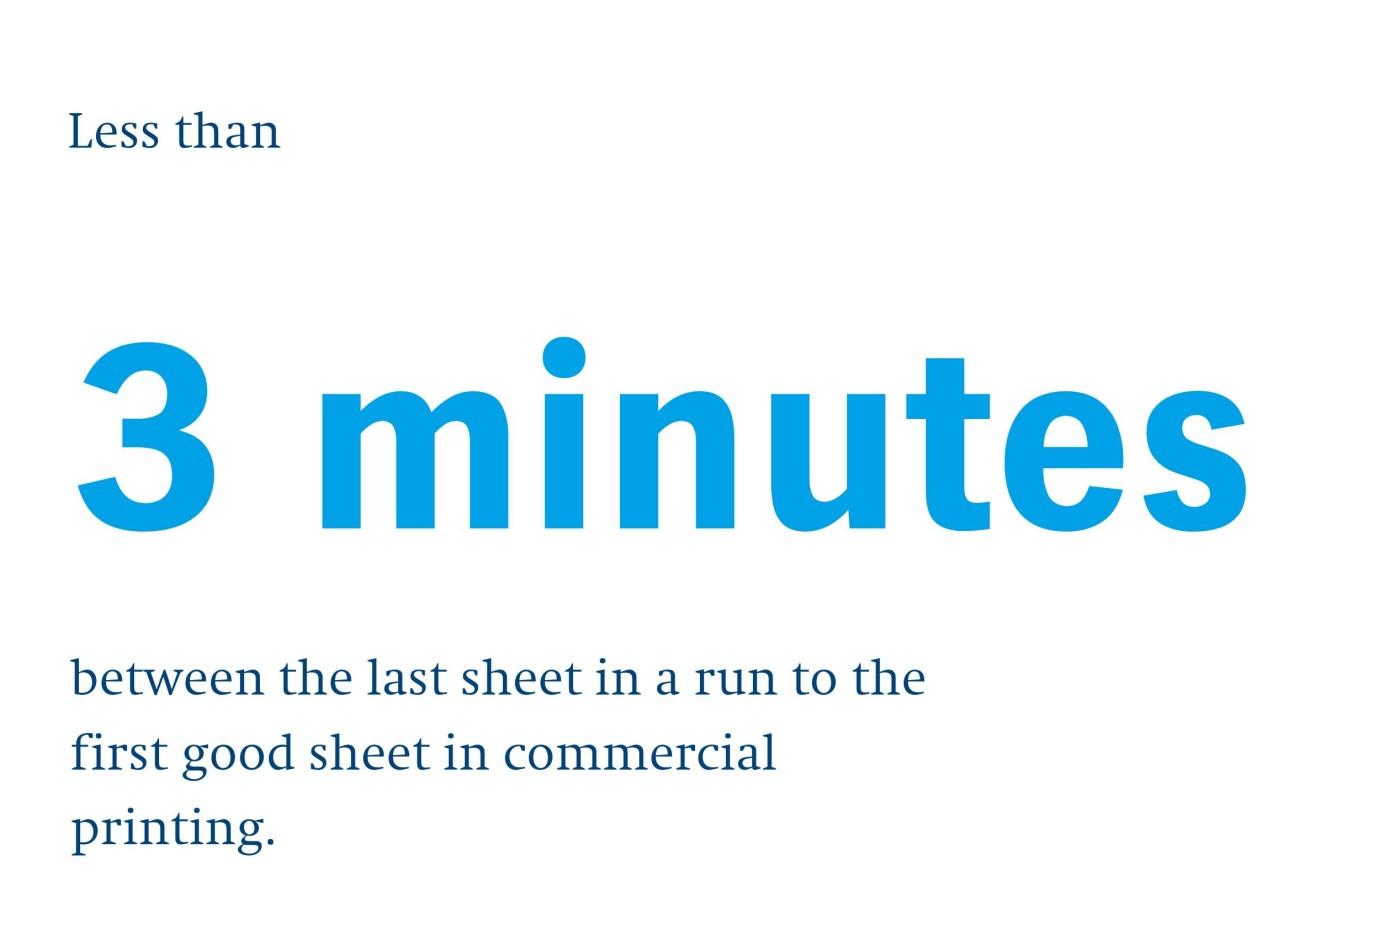 3_minutes_between_last_sheet